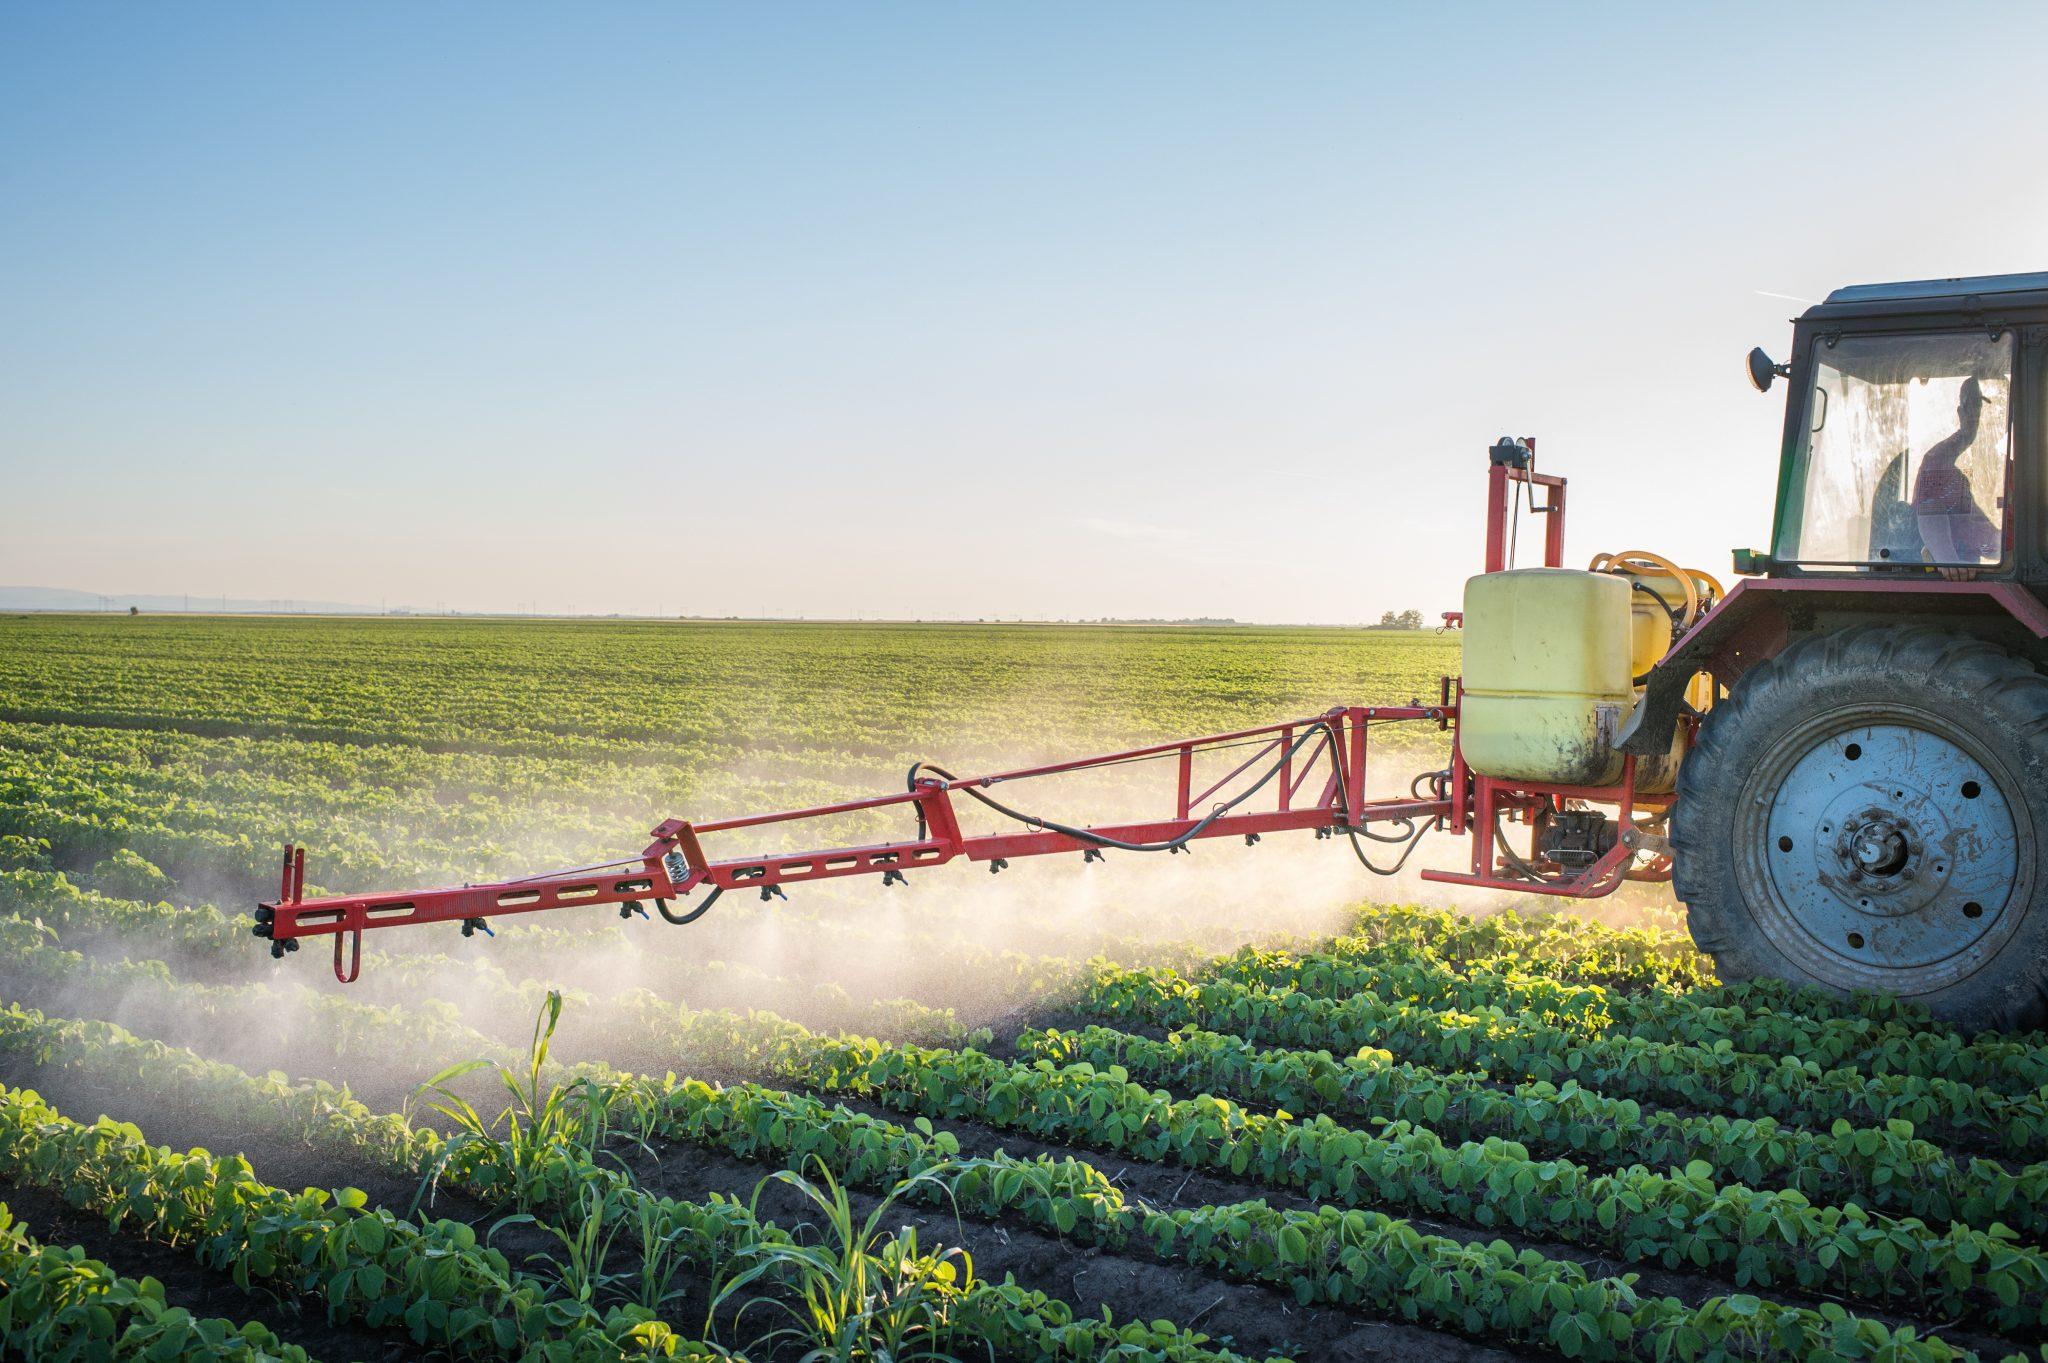 spraying soybeans. shutterstock.com/Fotokostic